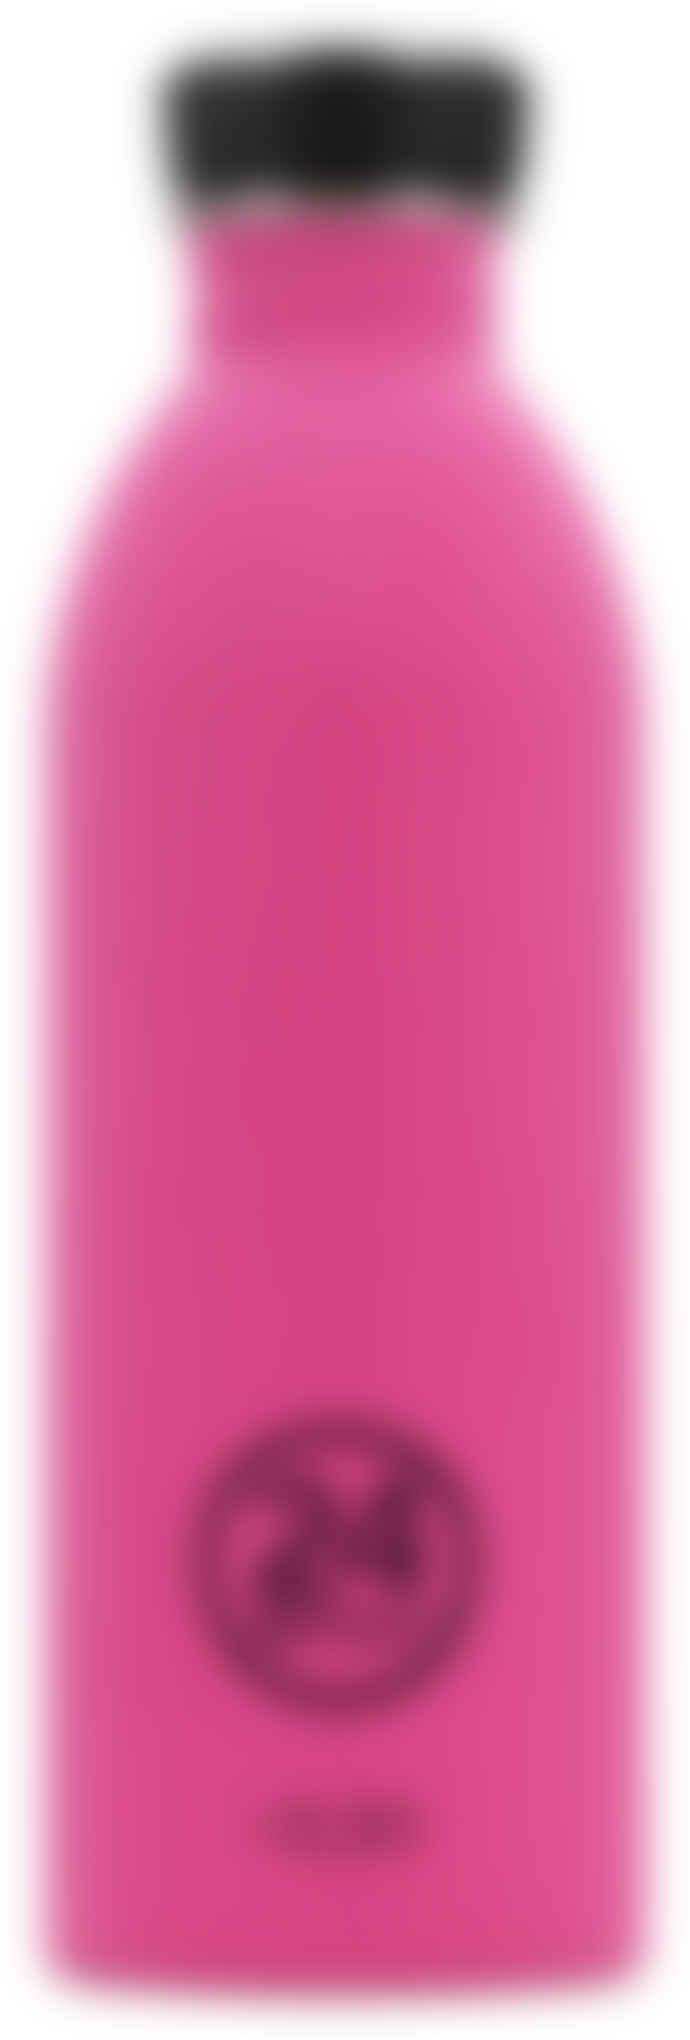 24Bottles 500ml Passion Pink Urban Bottle